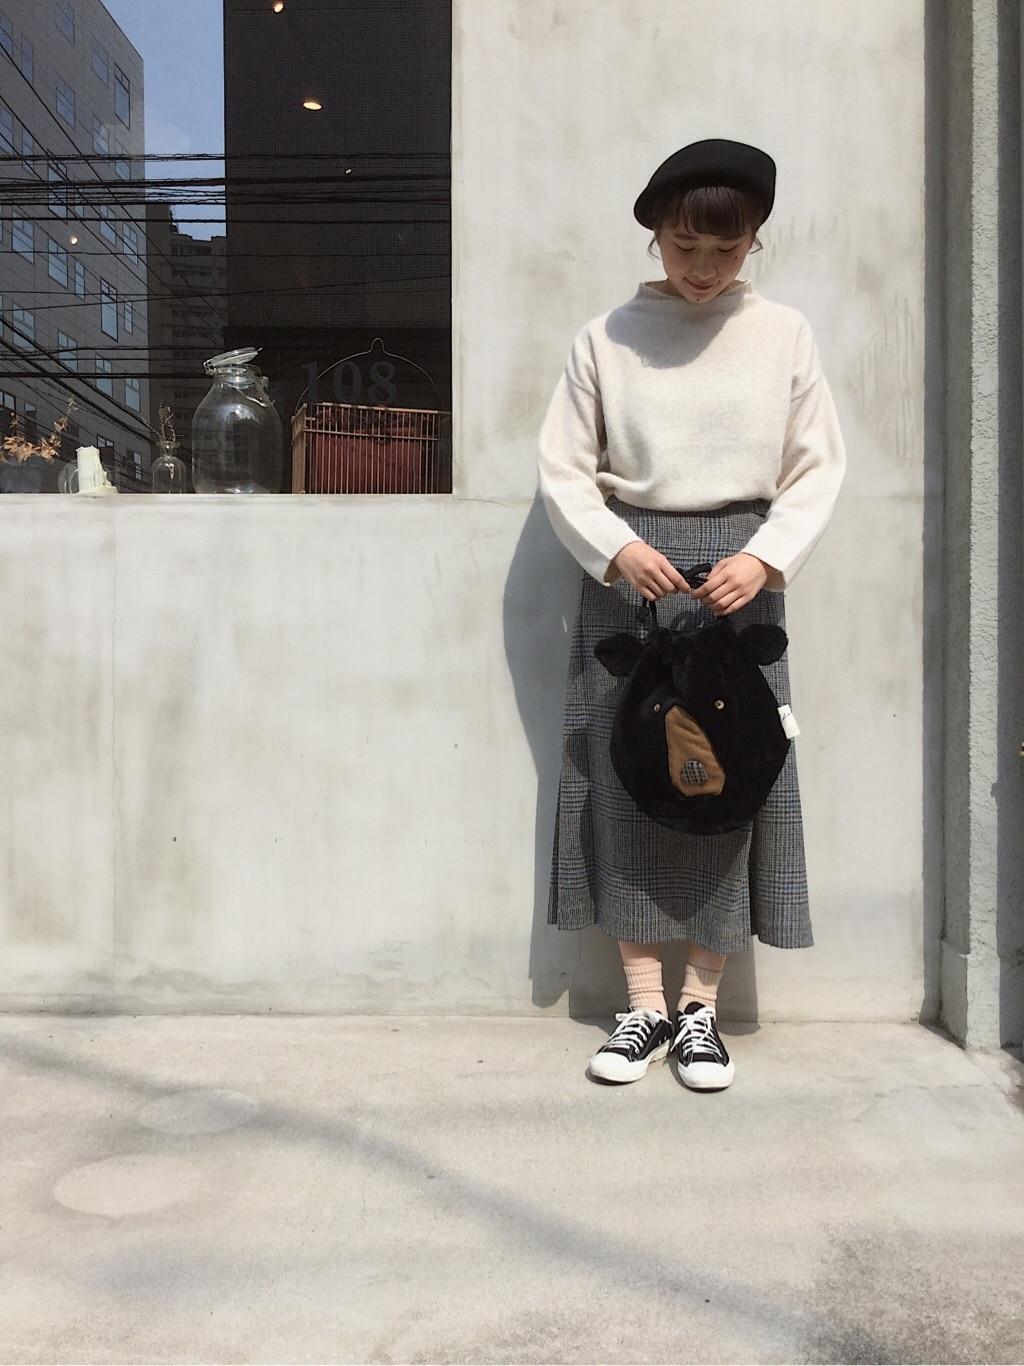 108 yuni / bulle de savon 福岡薬院路面 身長:158cm 2019.10.09